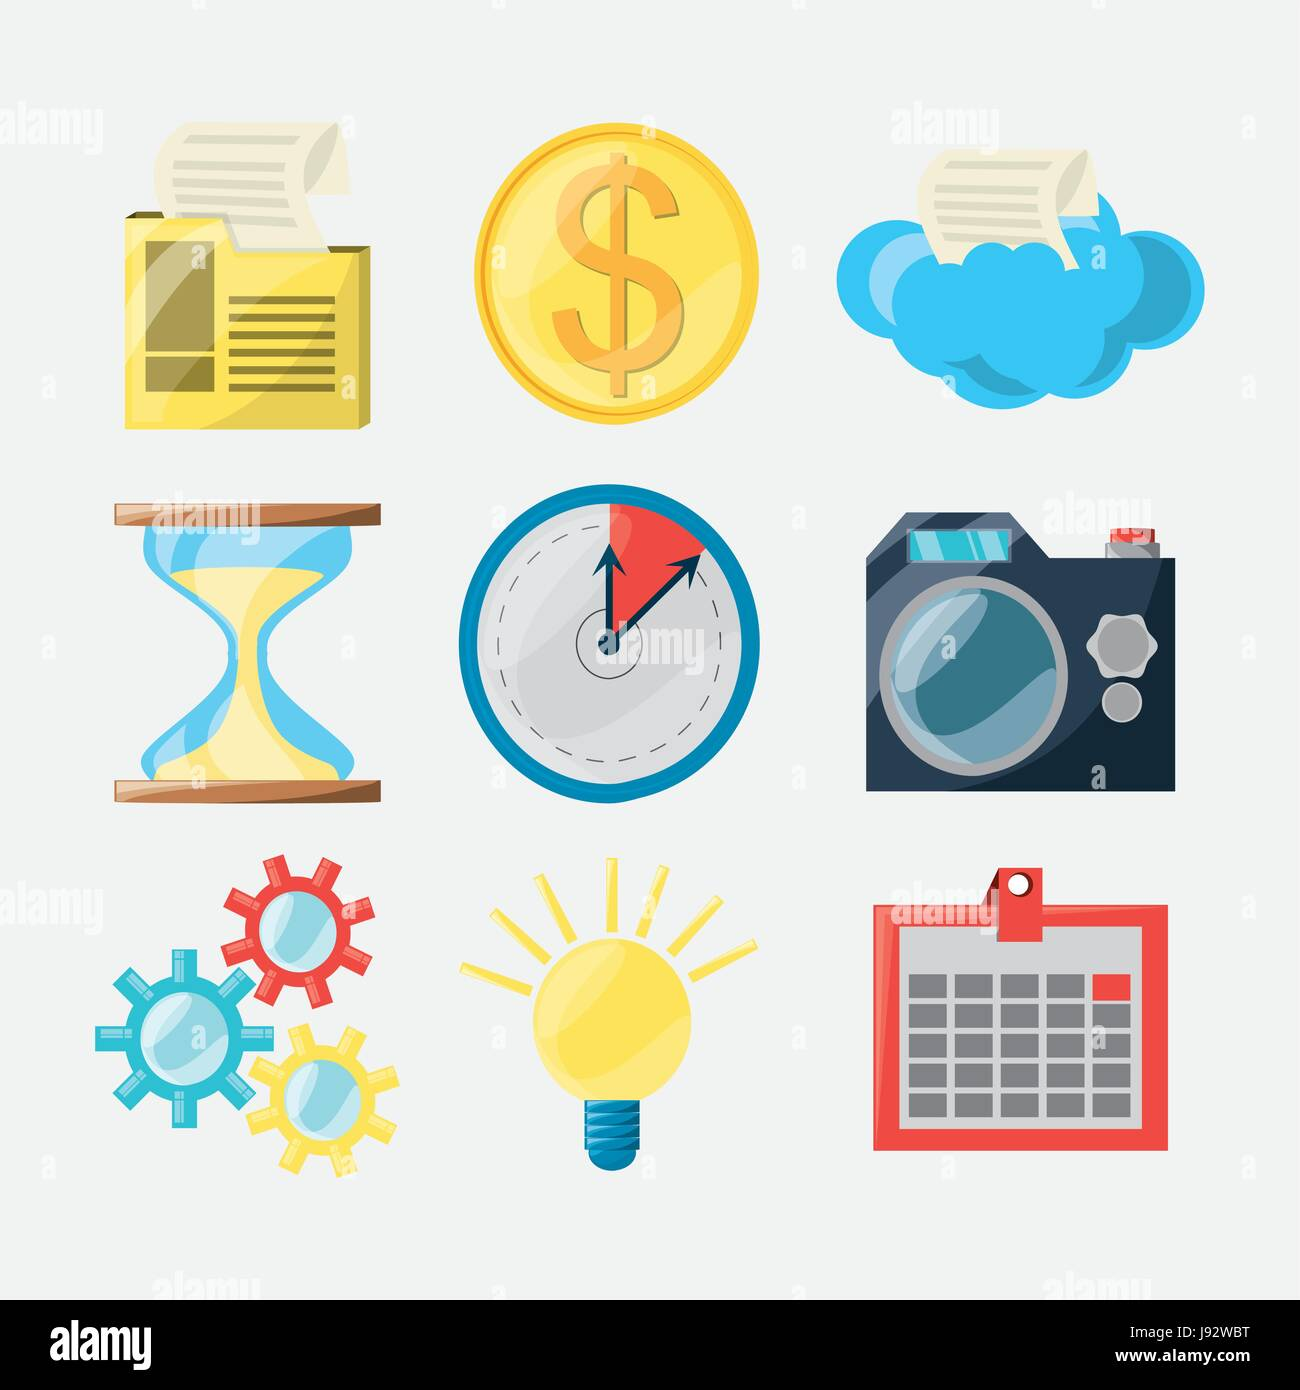 colorful set icon digital marketing stock vector art illustration vector image 143278684 alamy alamy